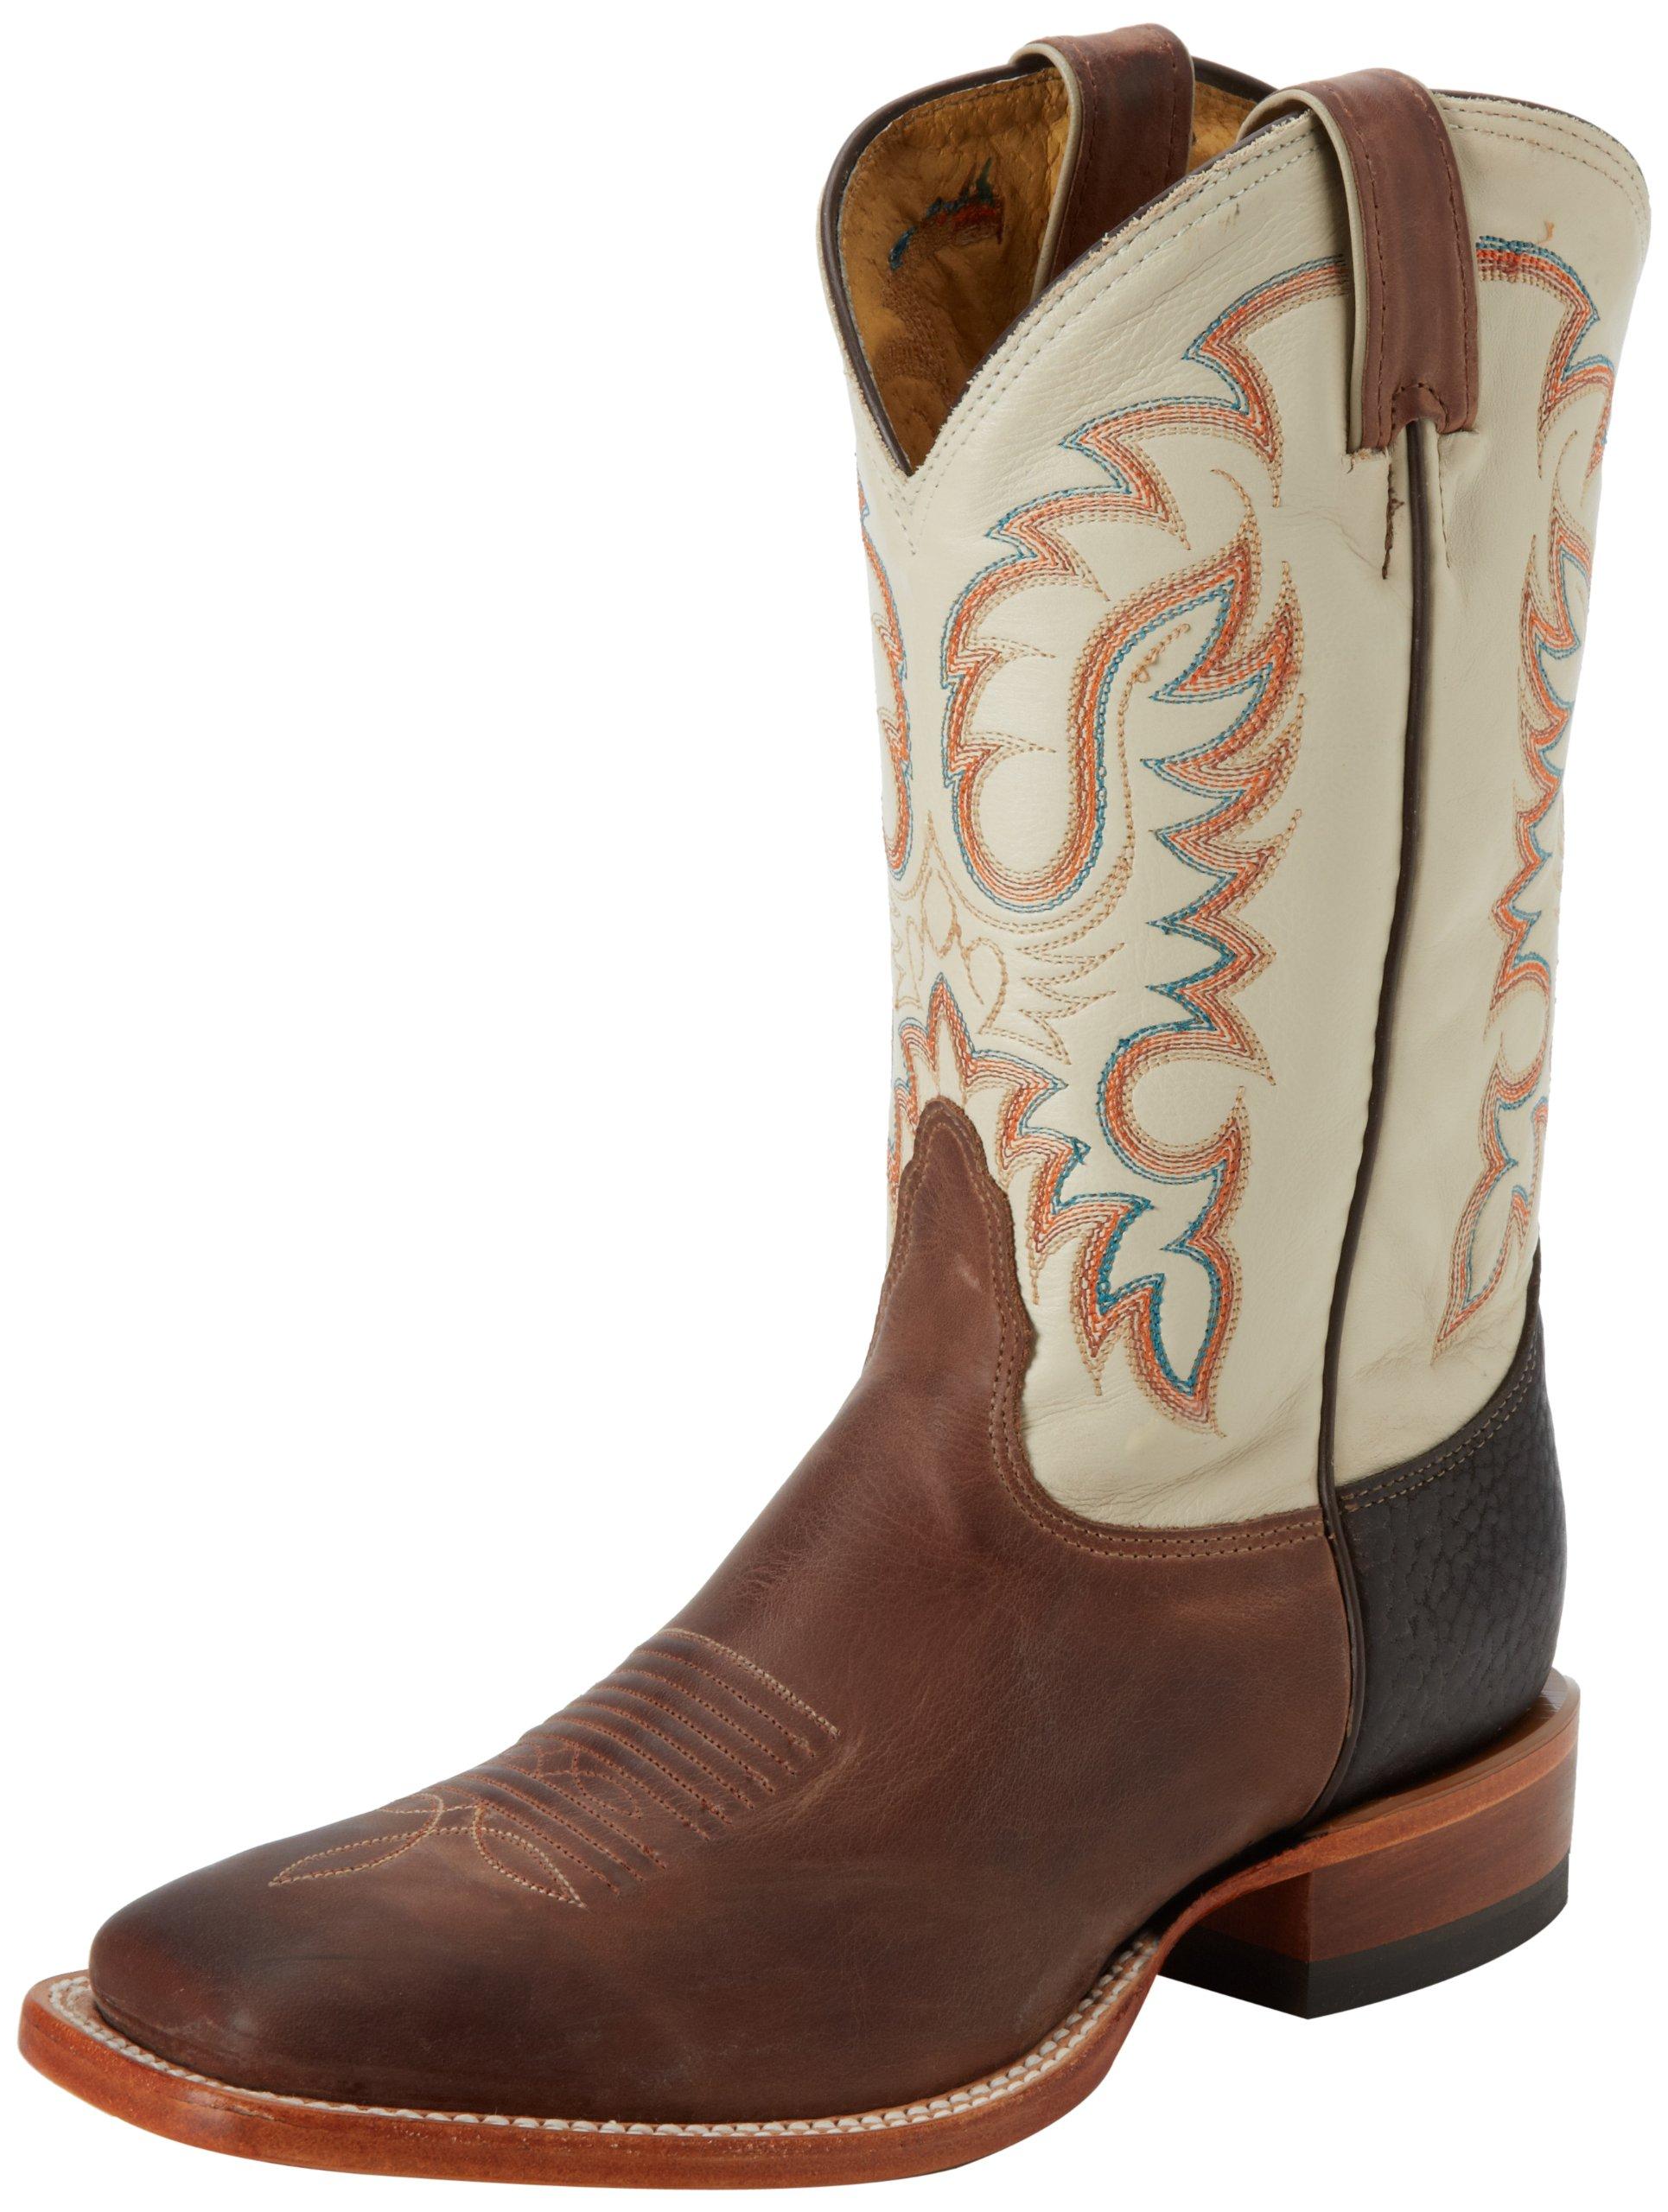 Nocona Boots Men S Md2735 11 Inch Boot